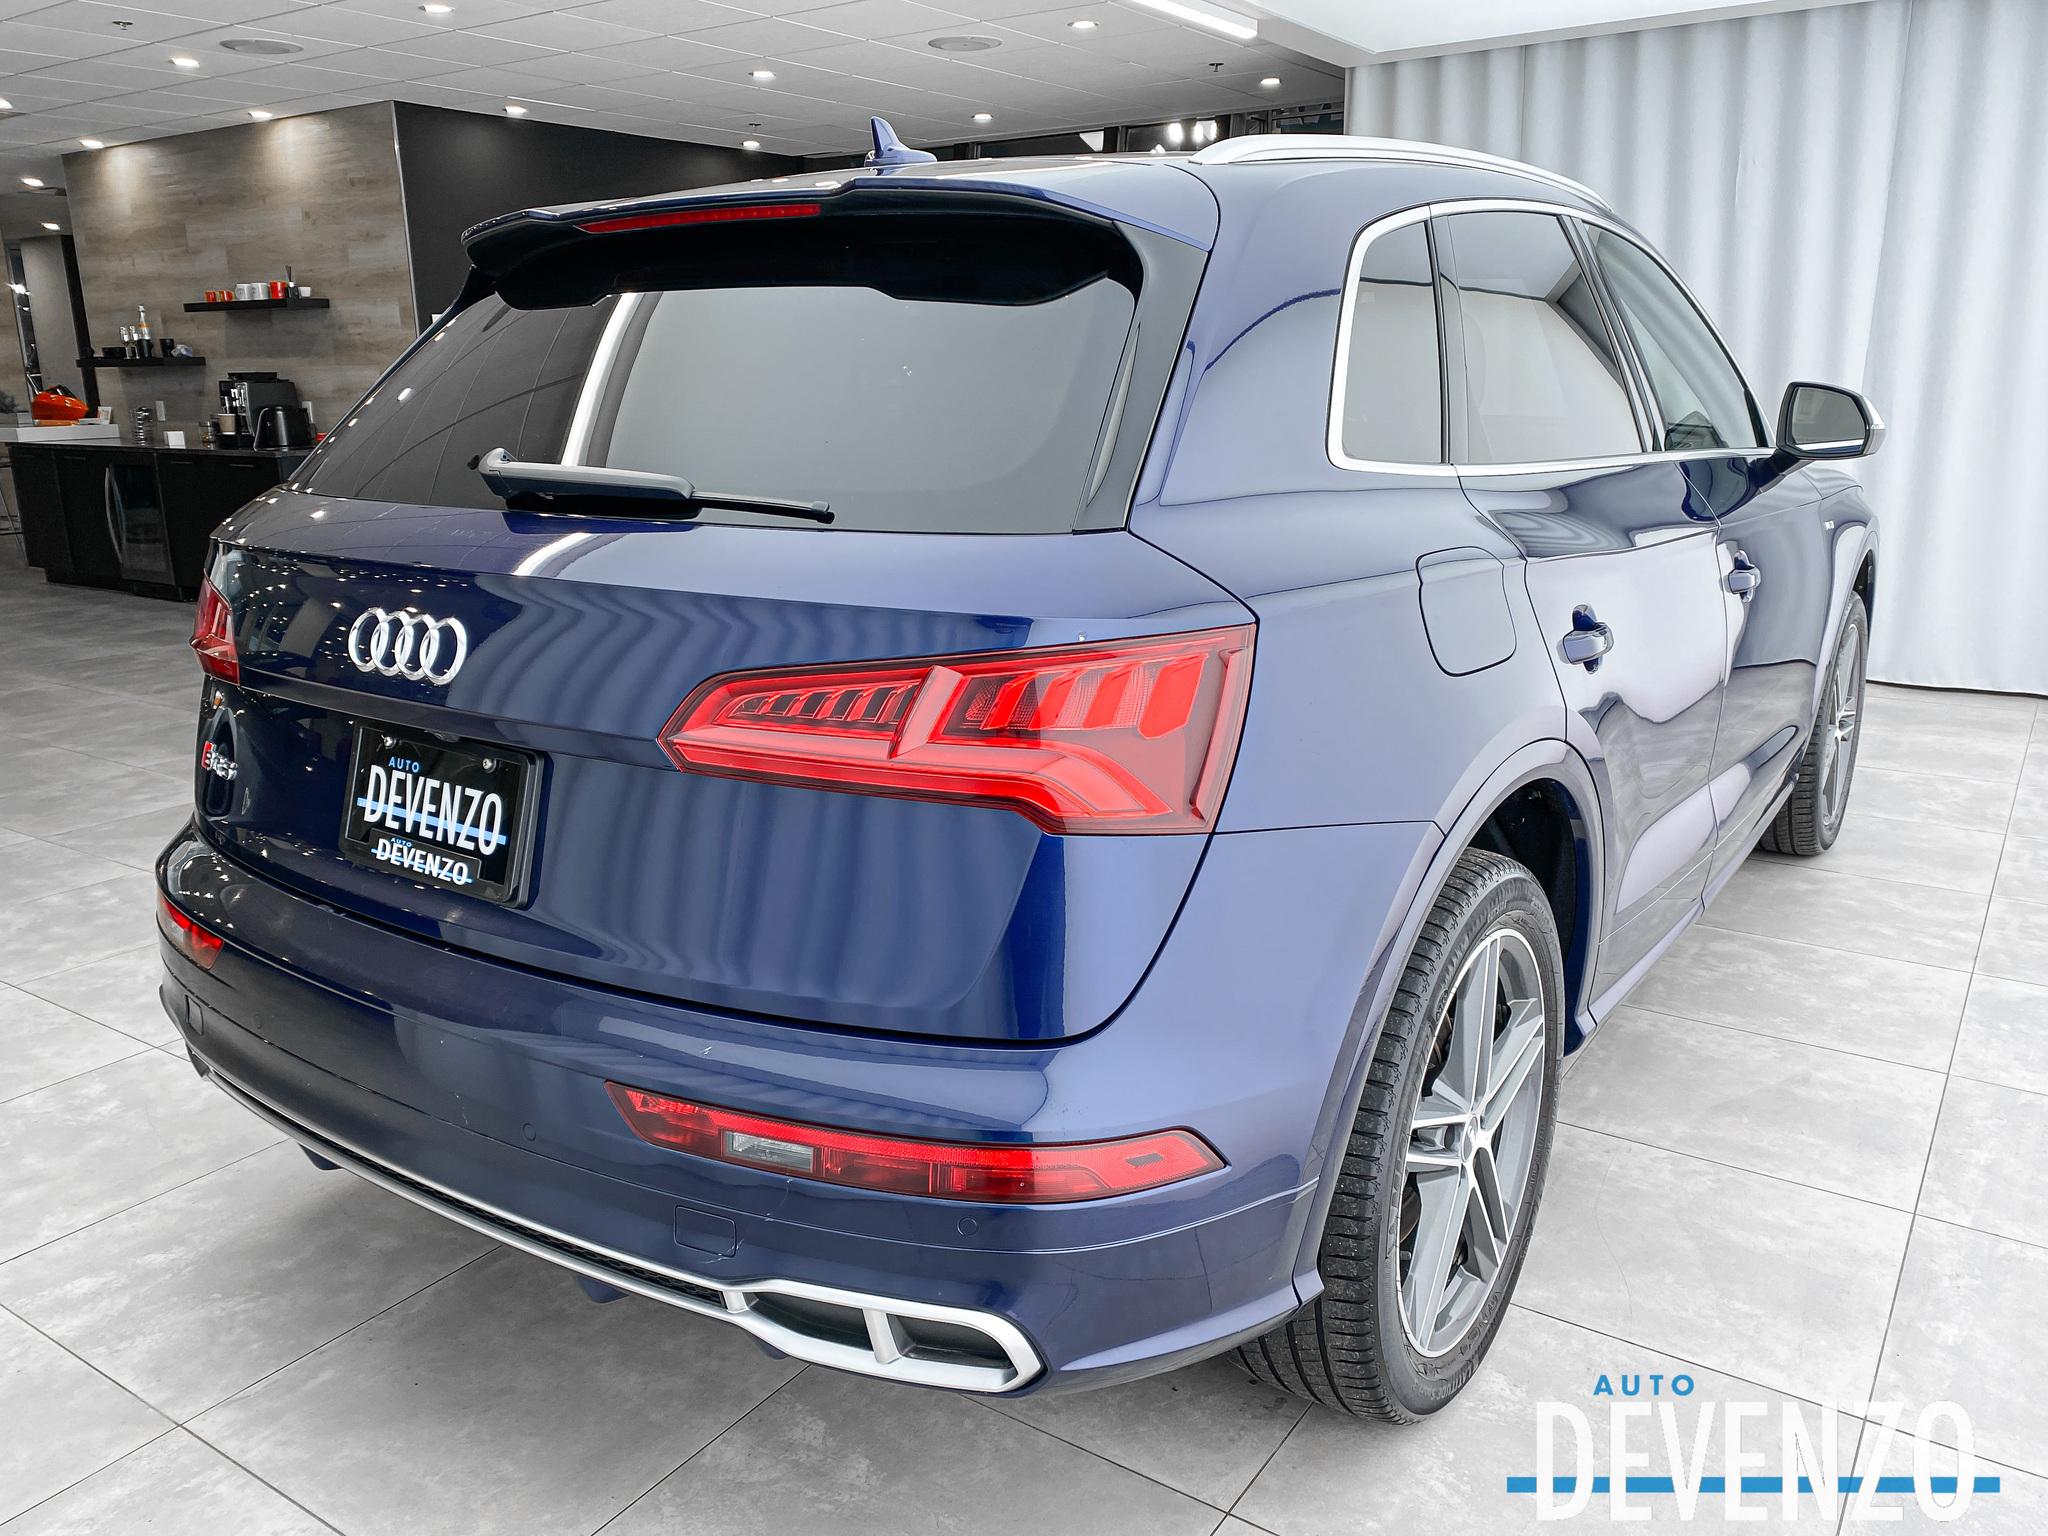 2018 Audi SQ5 3.0 TFSI QUATTRO 354HP TECHNIK BANG & OLUFSEN complet